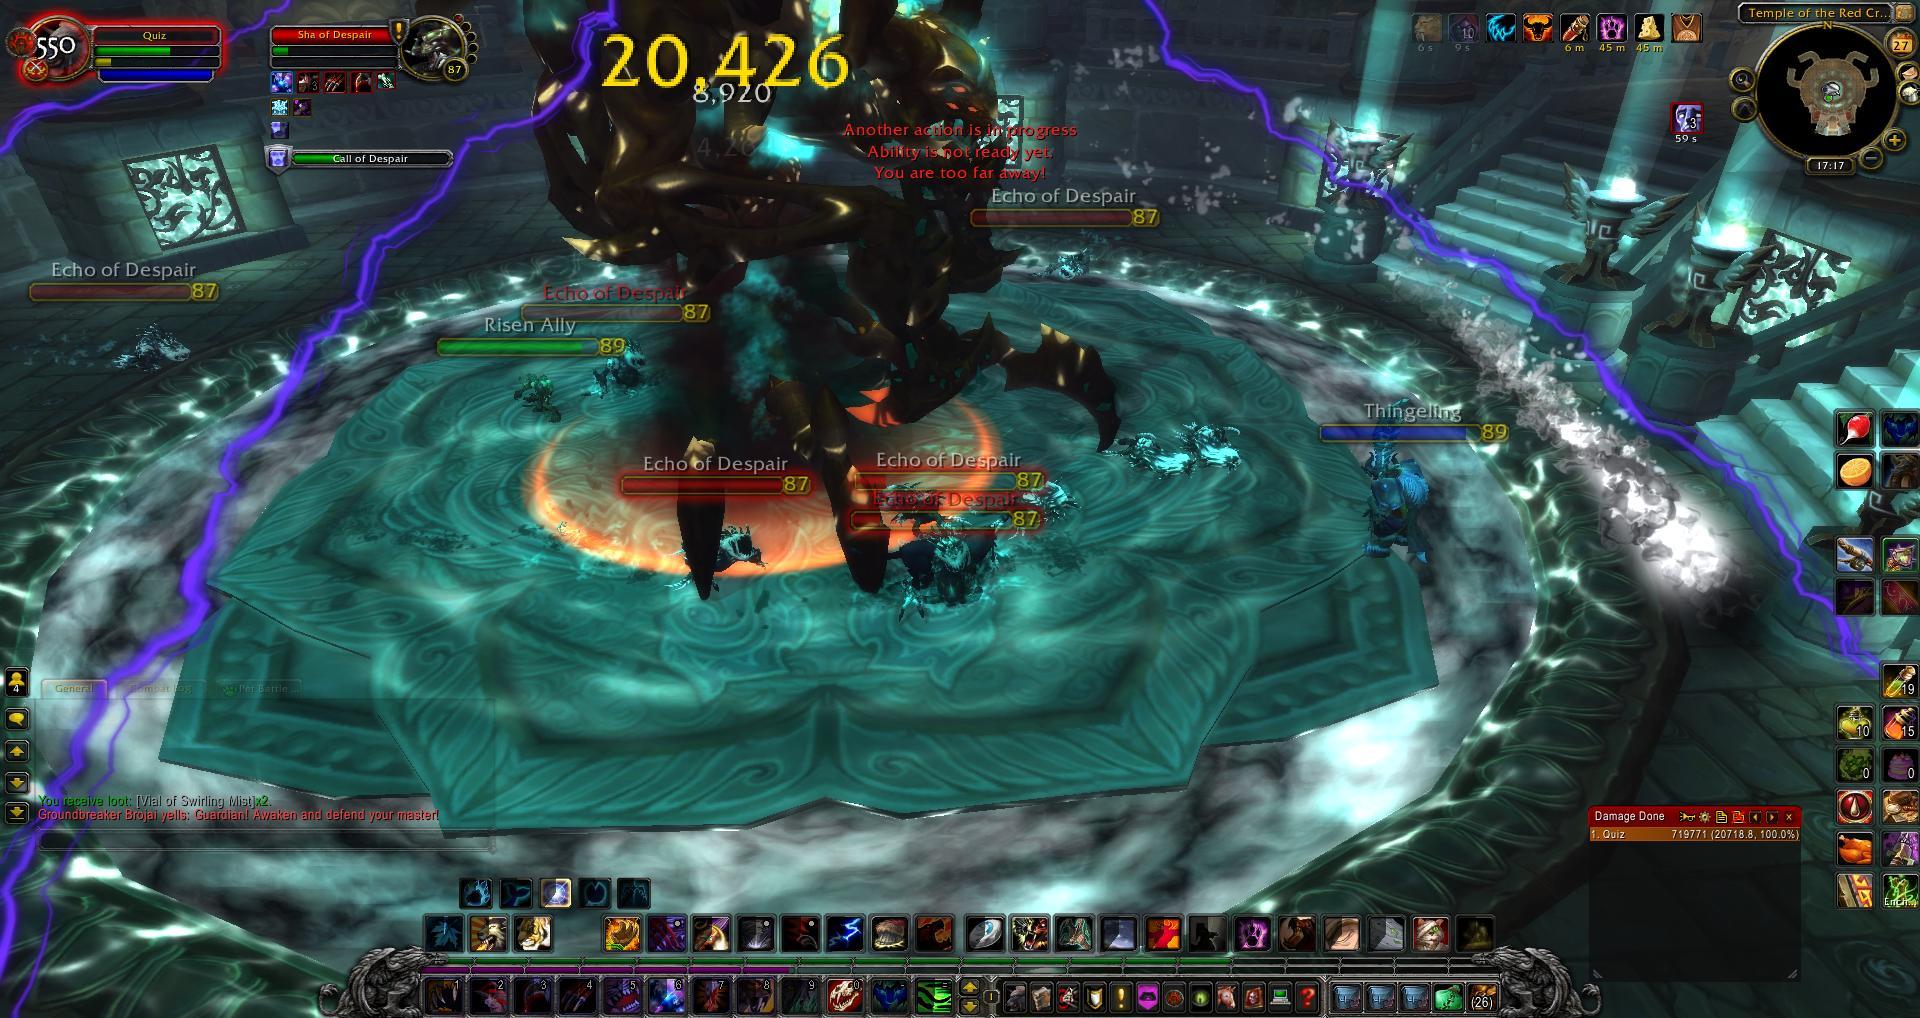 wow Sha of Despair wow screenshot - Gamingcfg.com